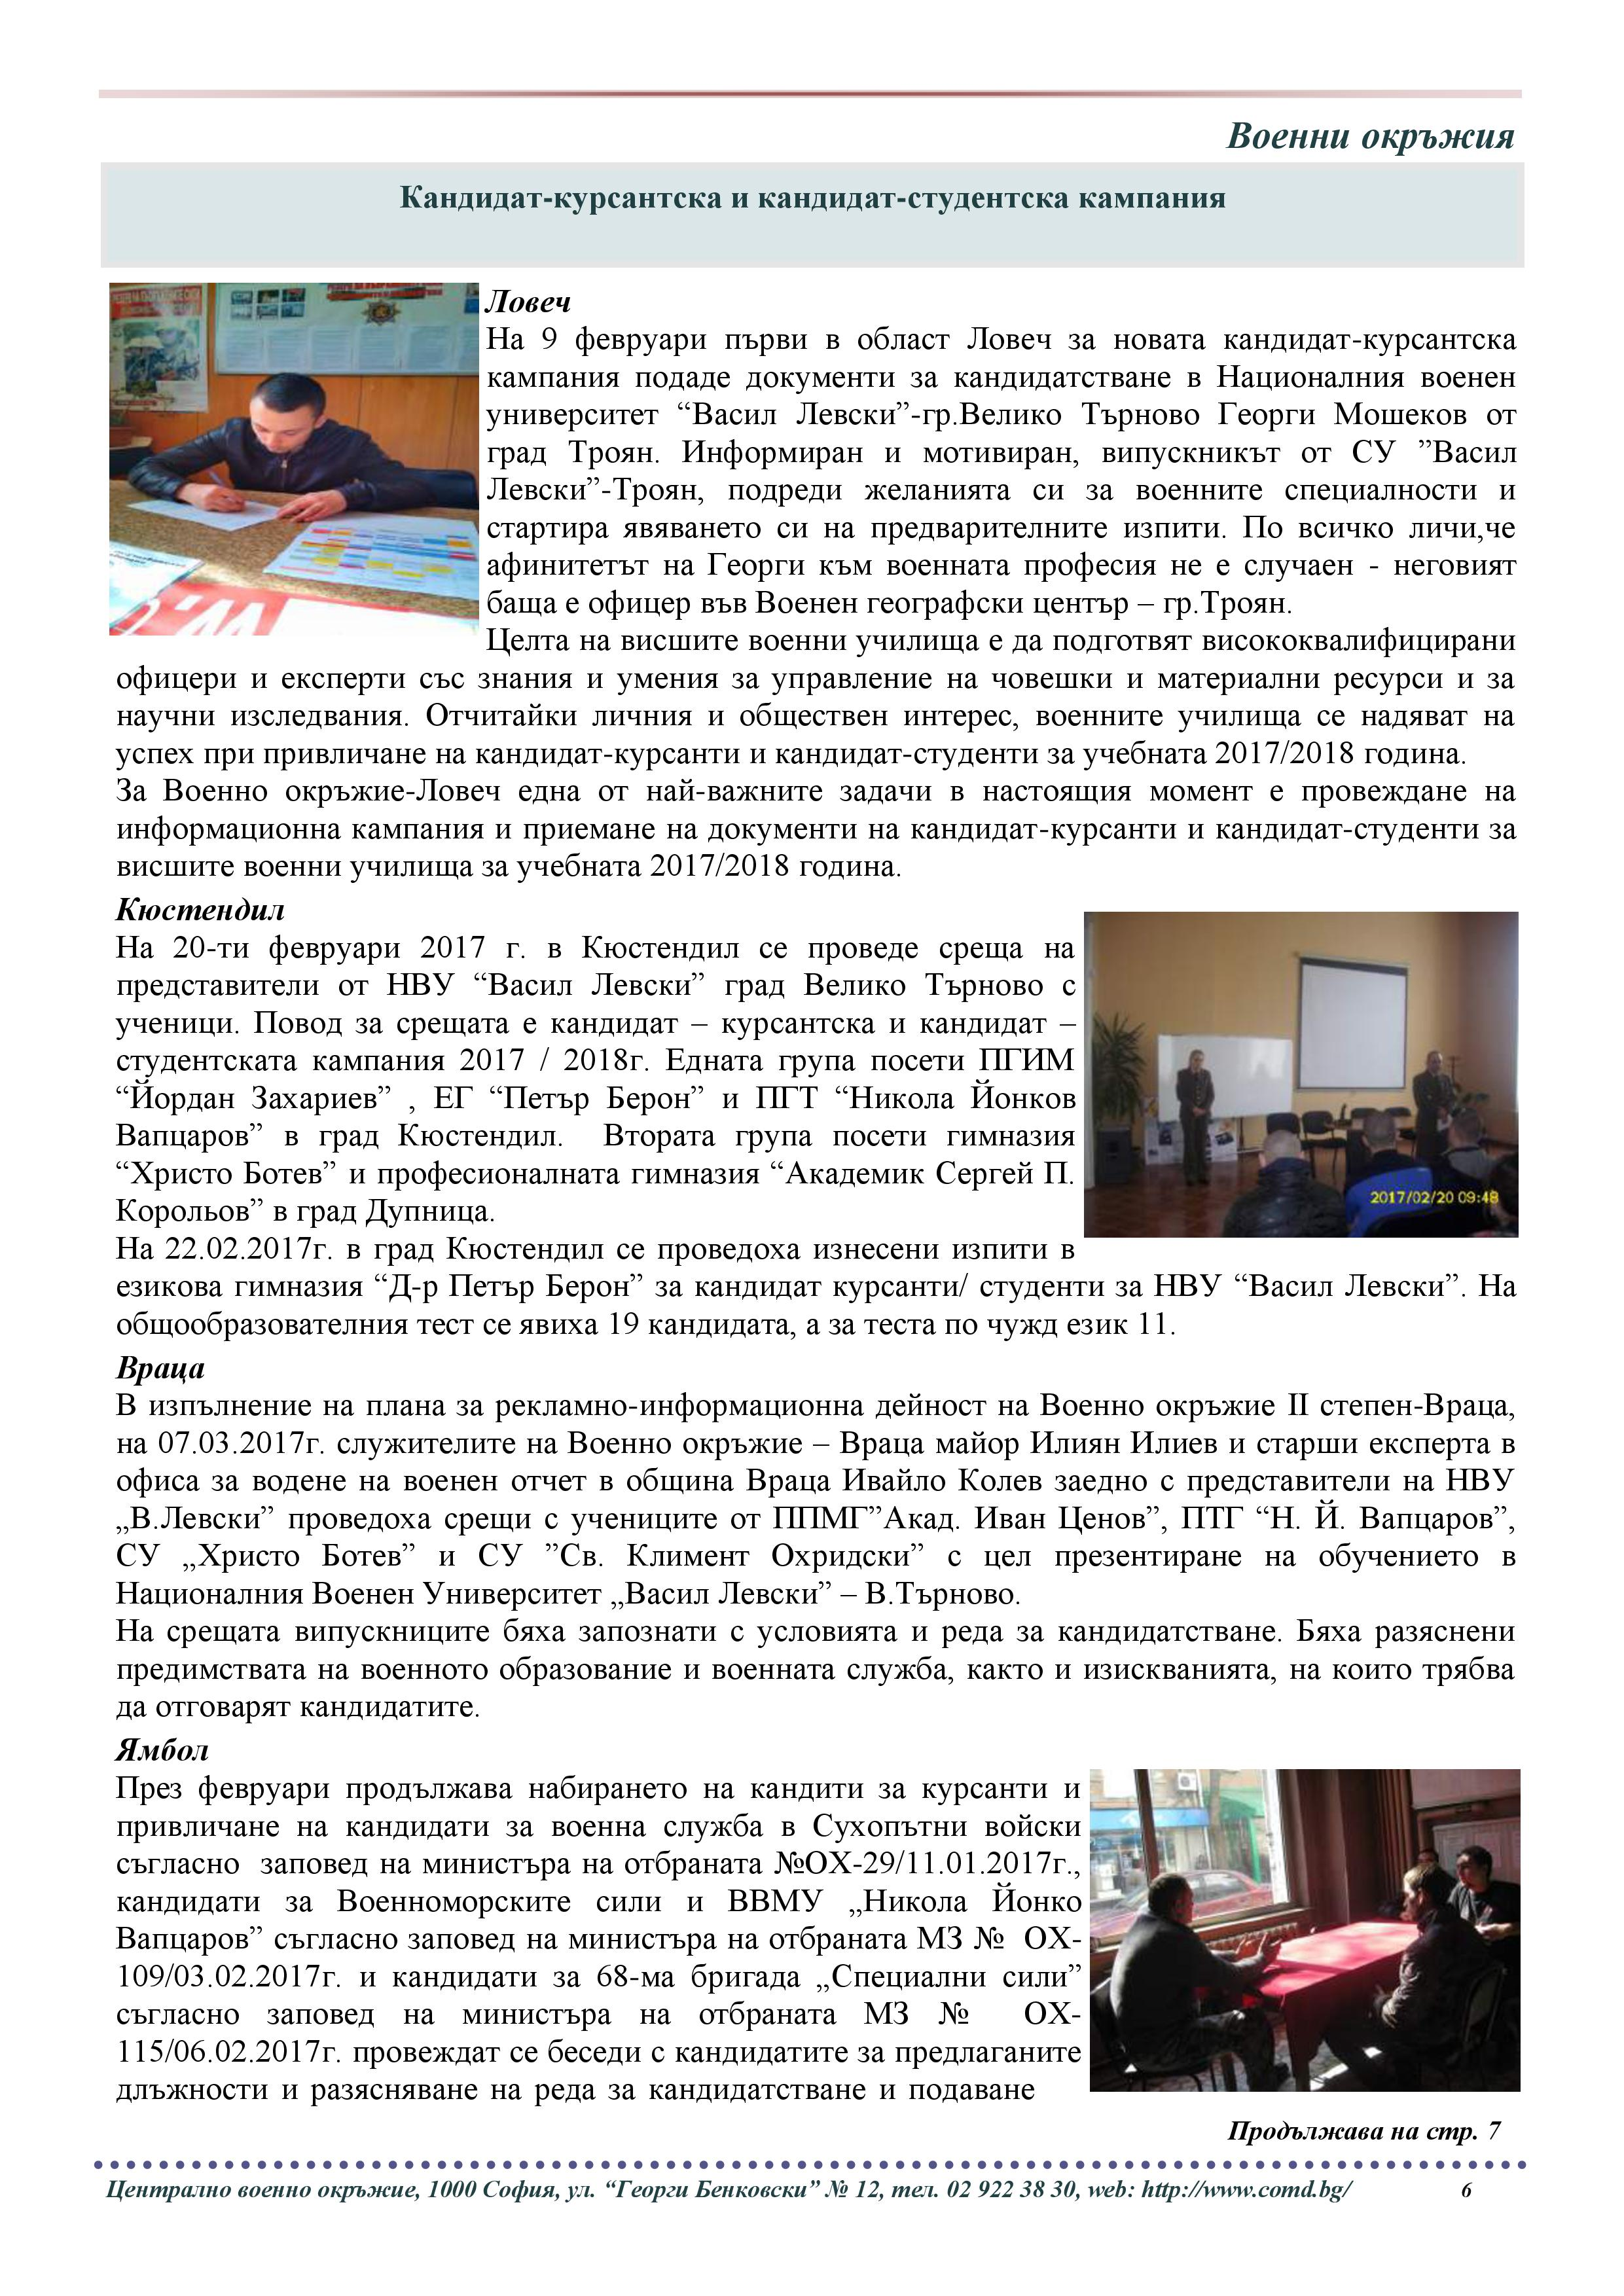 http://armymedia.bg/wp-content/uploads/2015/06/IB_2_2017g.compressed-za-izpra6tane-22.03.2017.page06.jpg